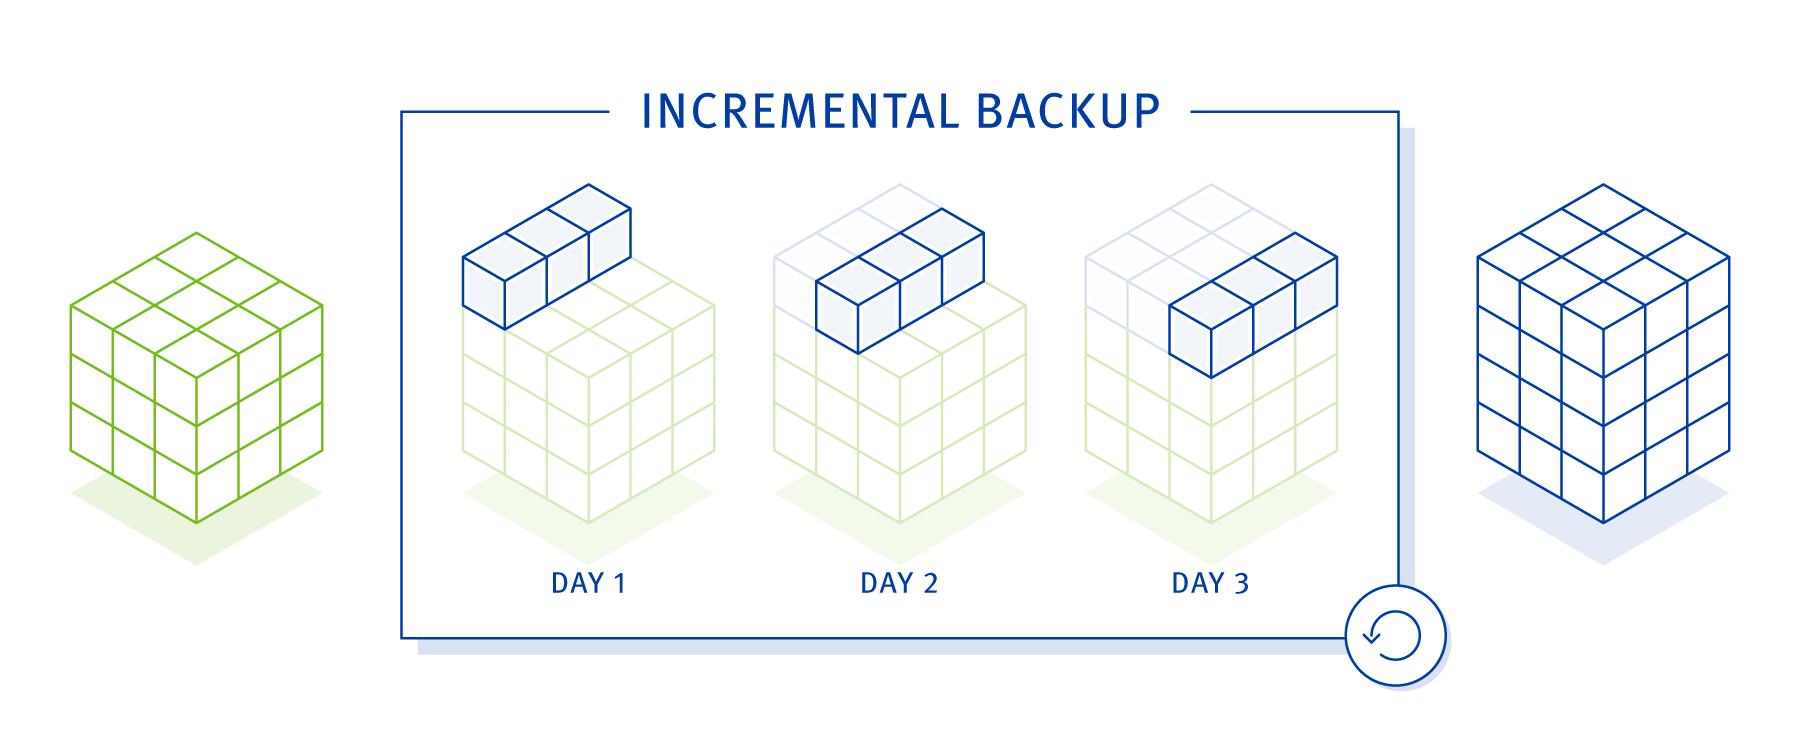 backup strategy - incremental backup